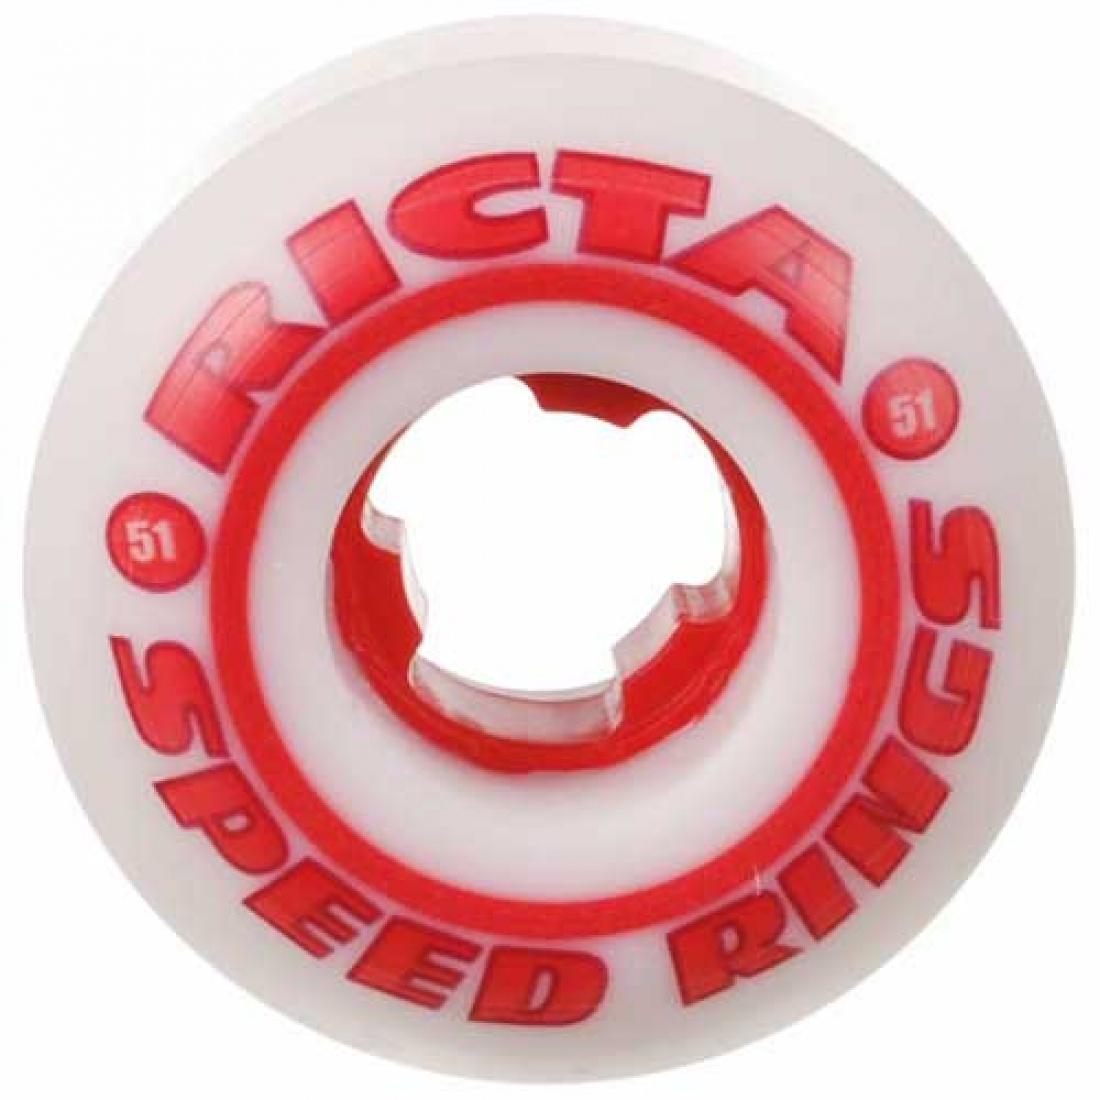 RCA-Speedrings 81b White/Red 51mm (Set of 4)